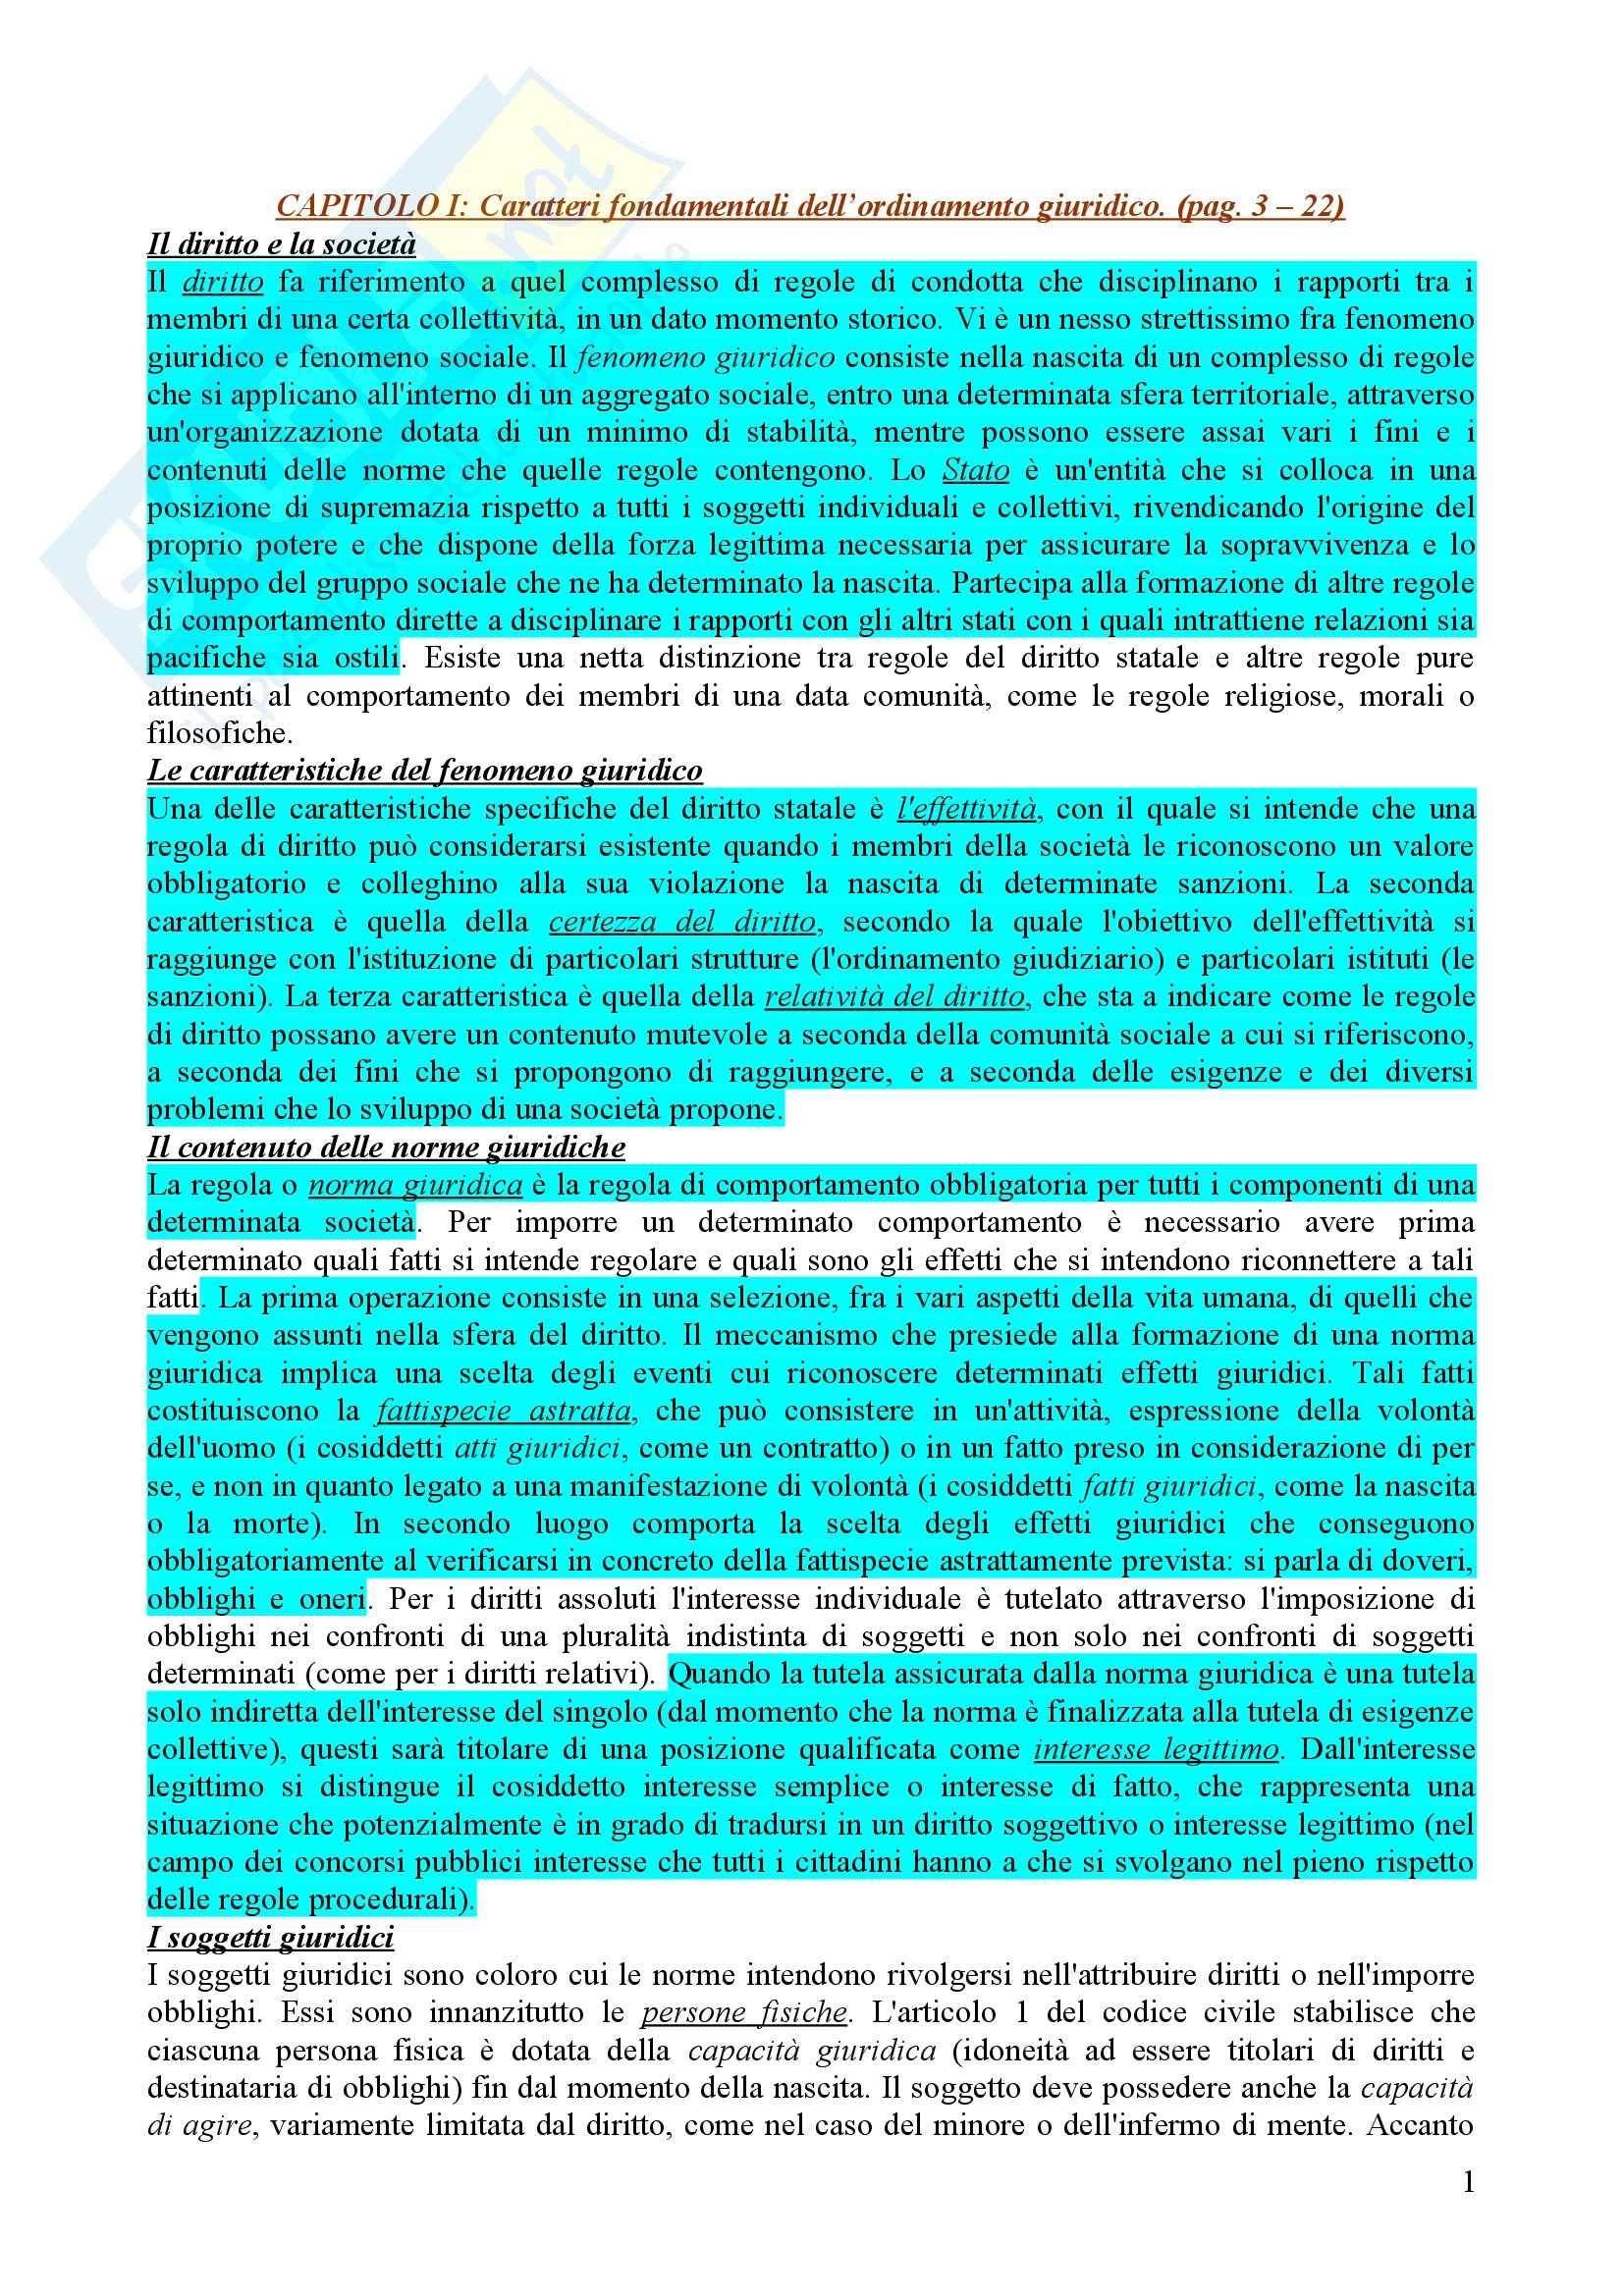 Riassunto esame diritto pubblico, prof. Caravita